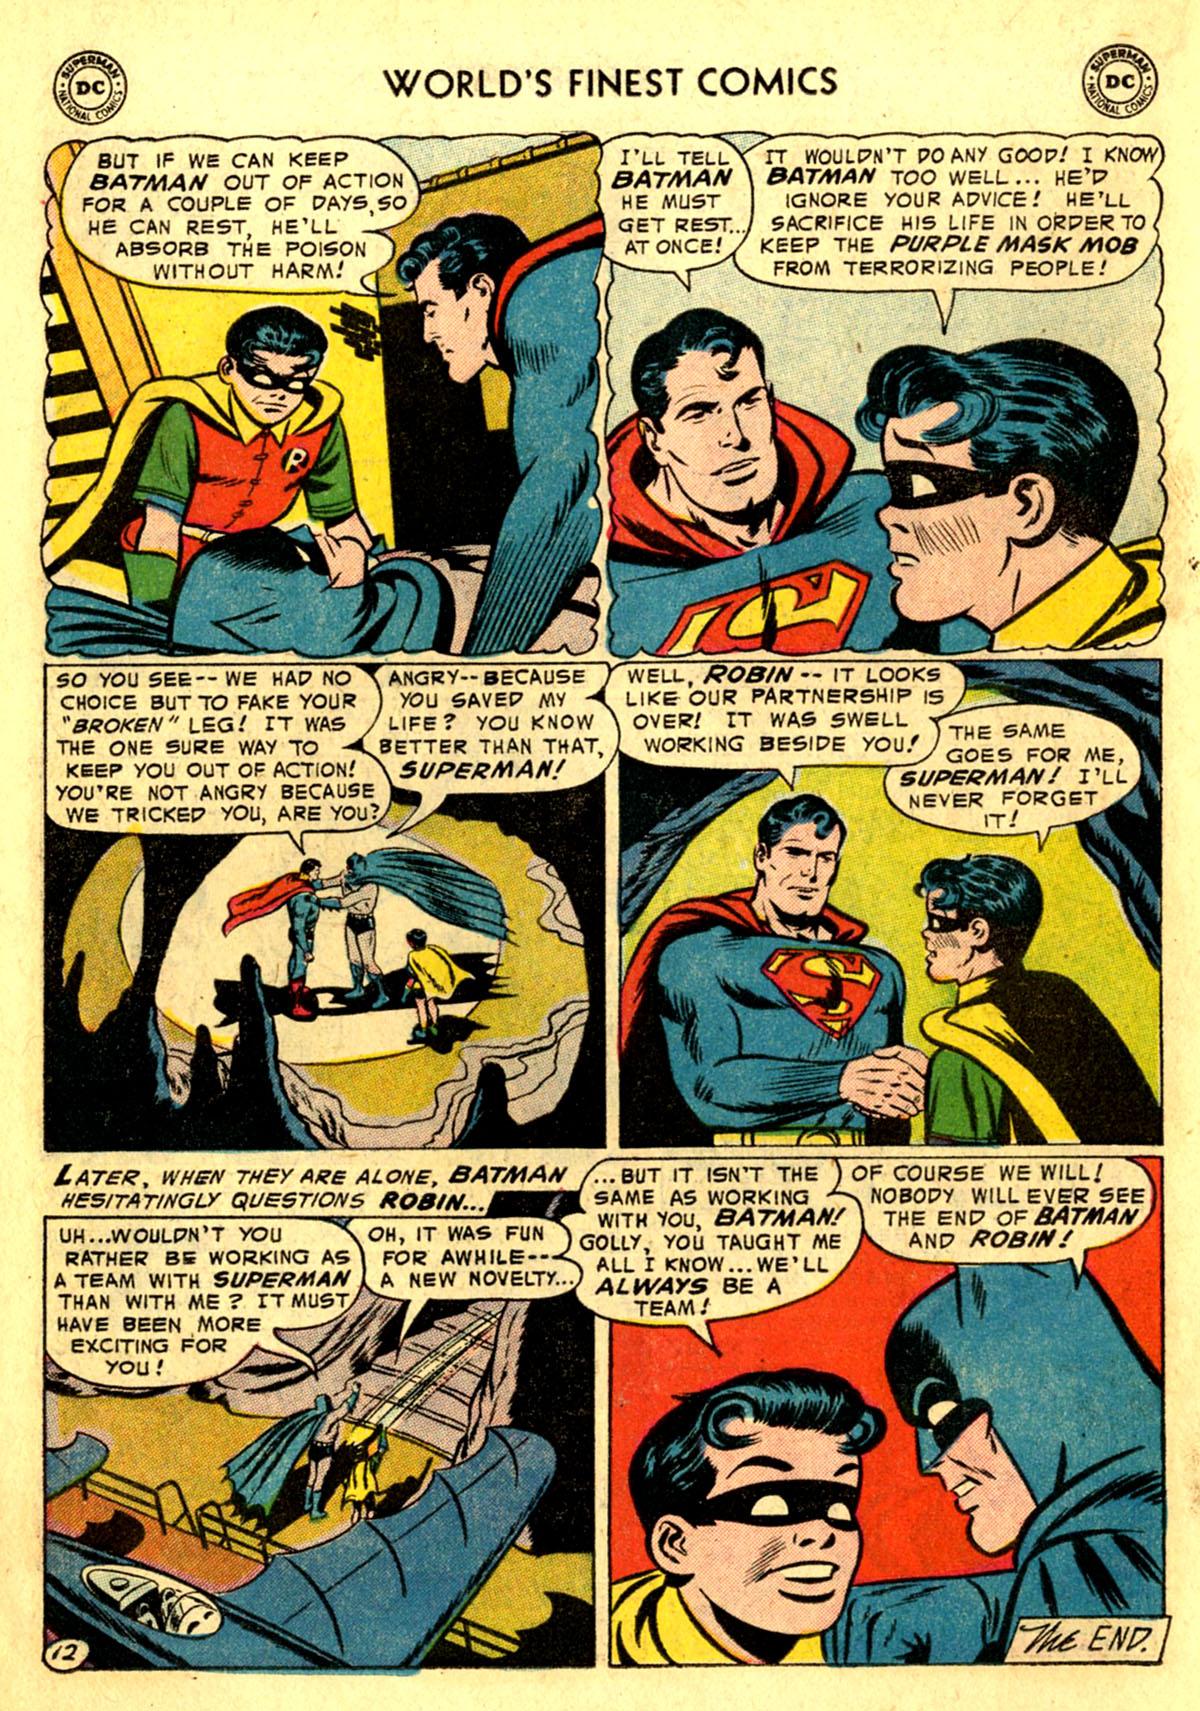 Read online World's Finest Comics comic -  Issue #75 - 14